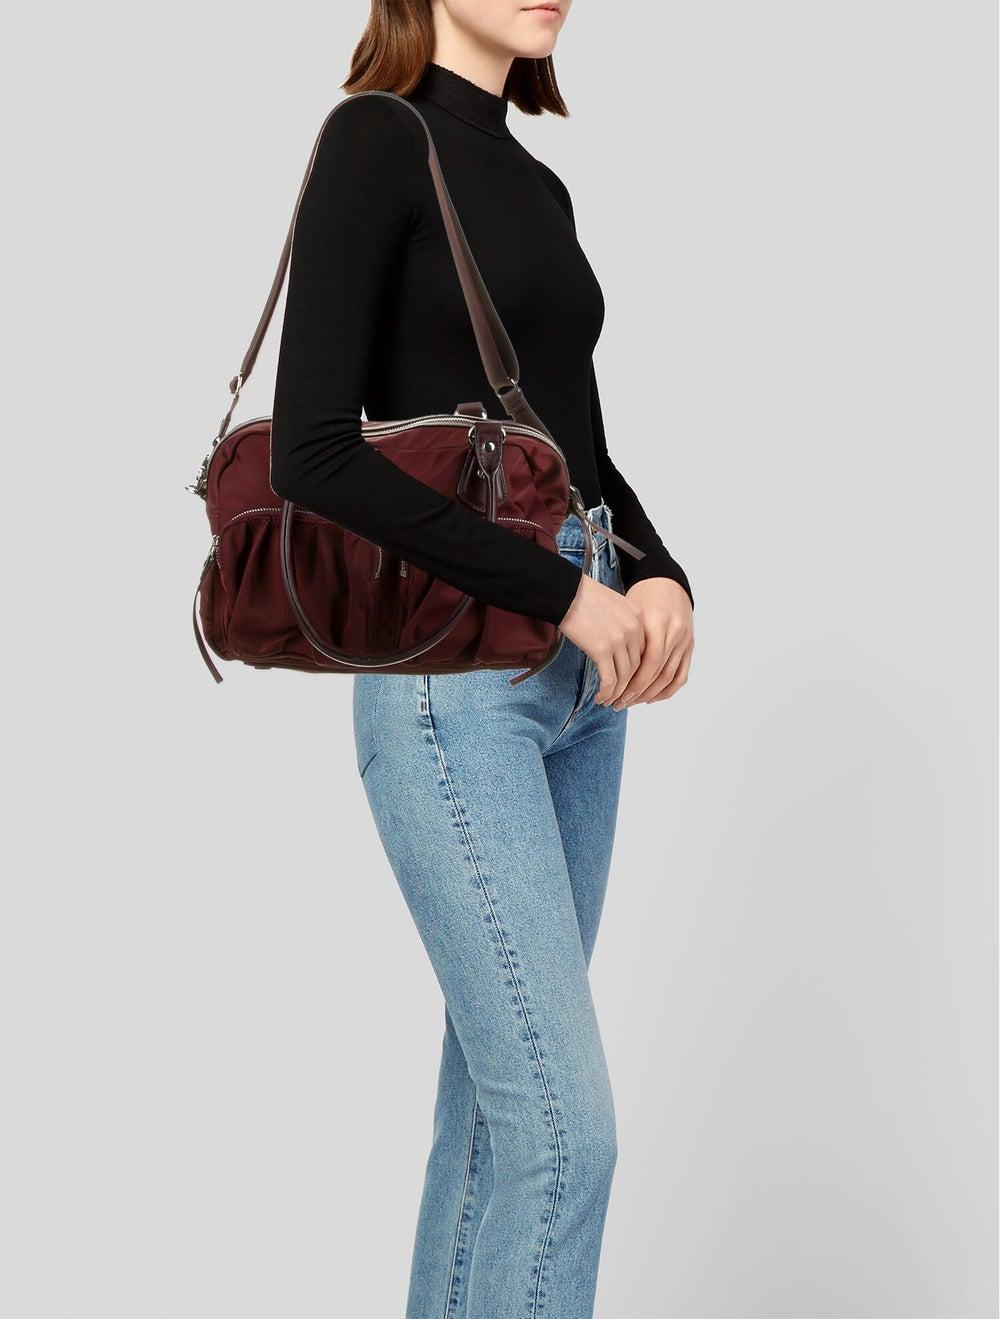 MZ Wallace Nylon Shoulder Bag Red - image 2